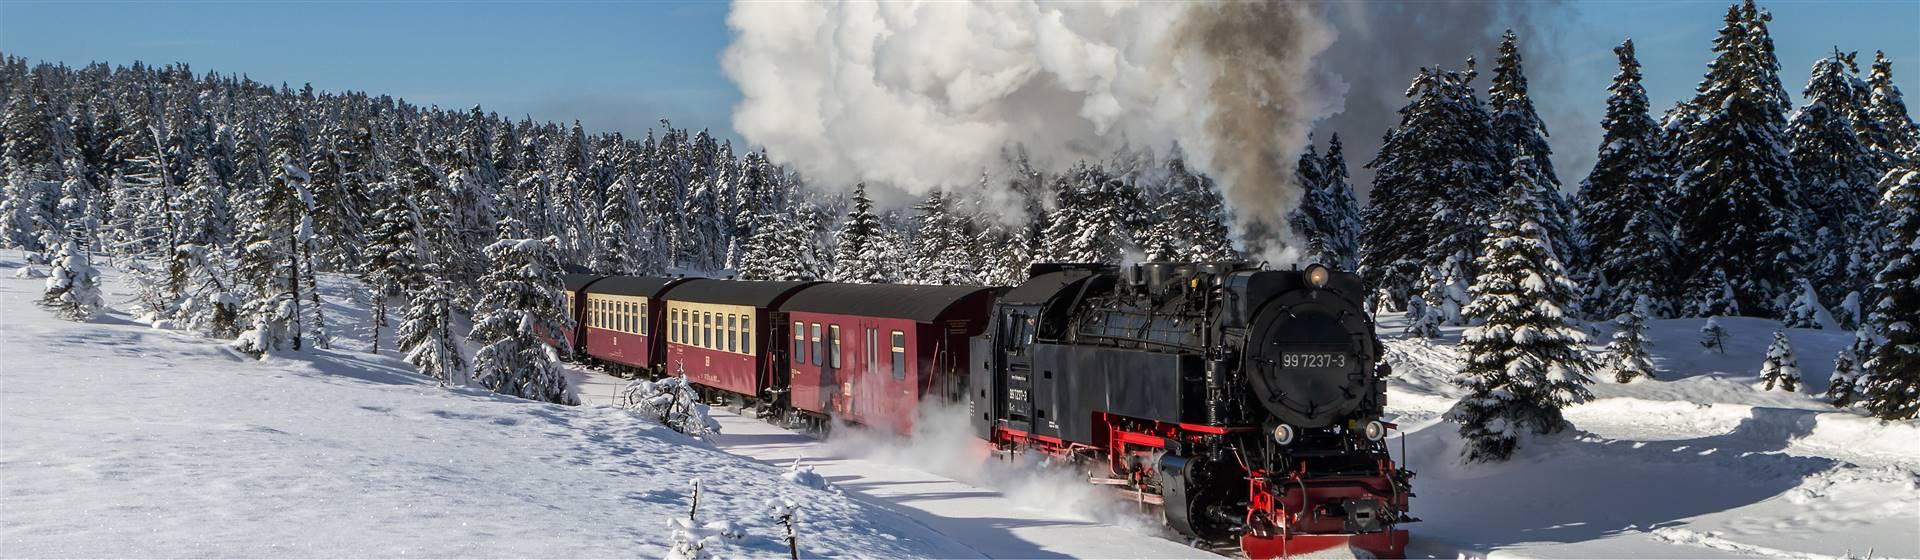 "<img src=""brockenbahnderhsbimwinteradobe.jpeg"" alt=""Harz Steam Loco""/>"